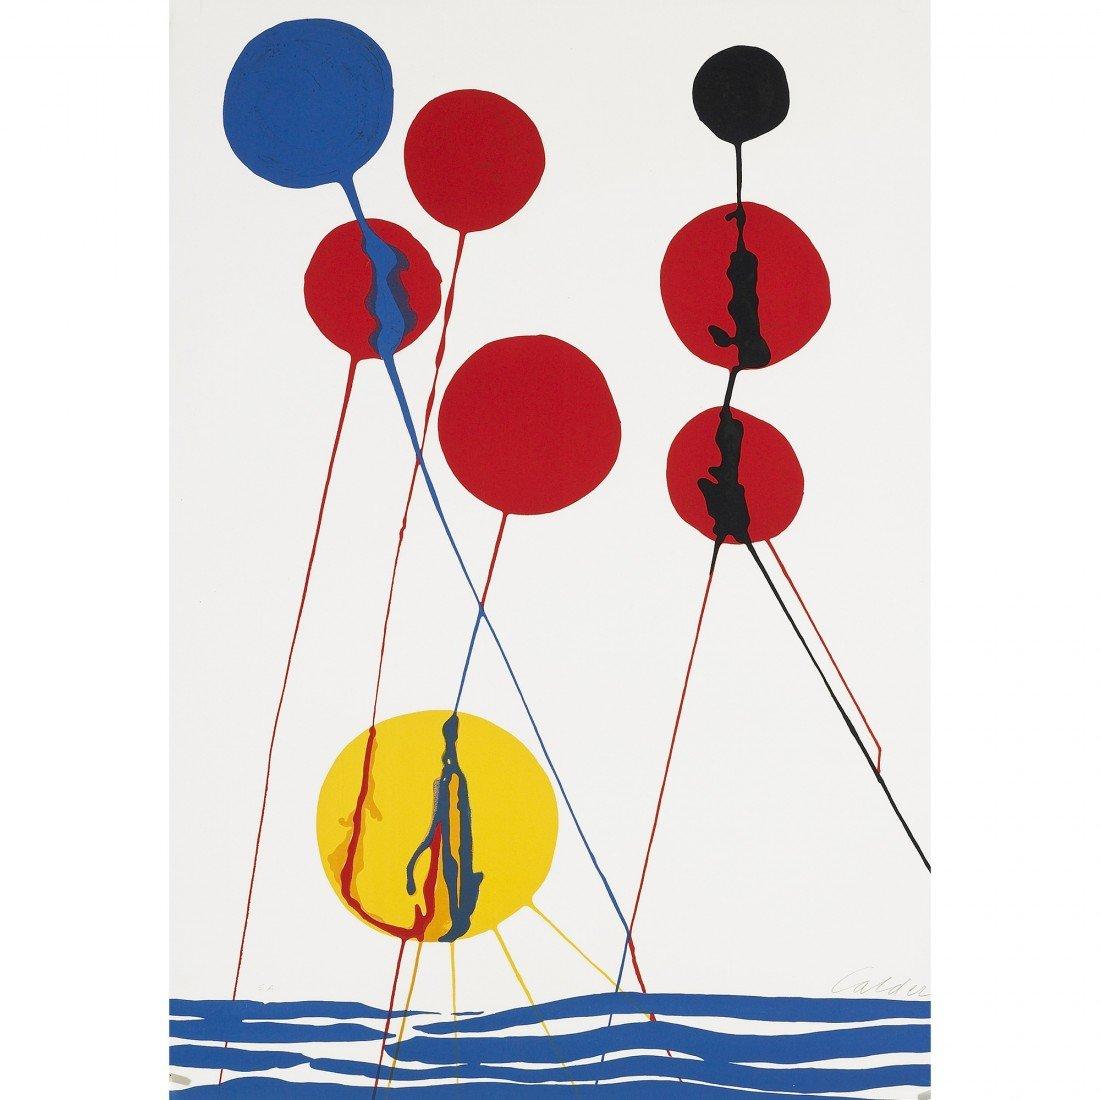 168: Alexander Calder Balloons